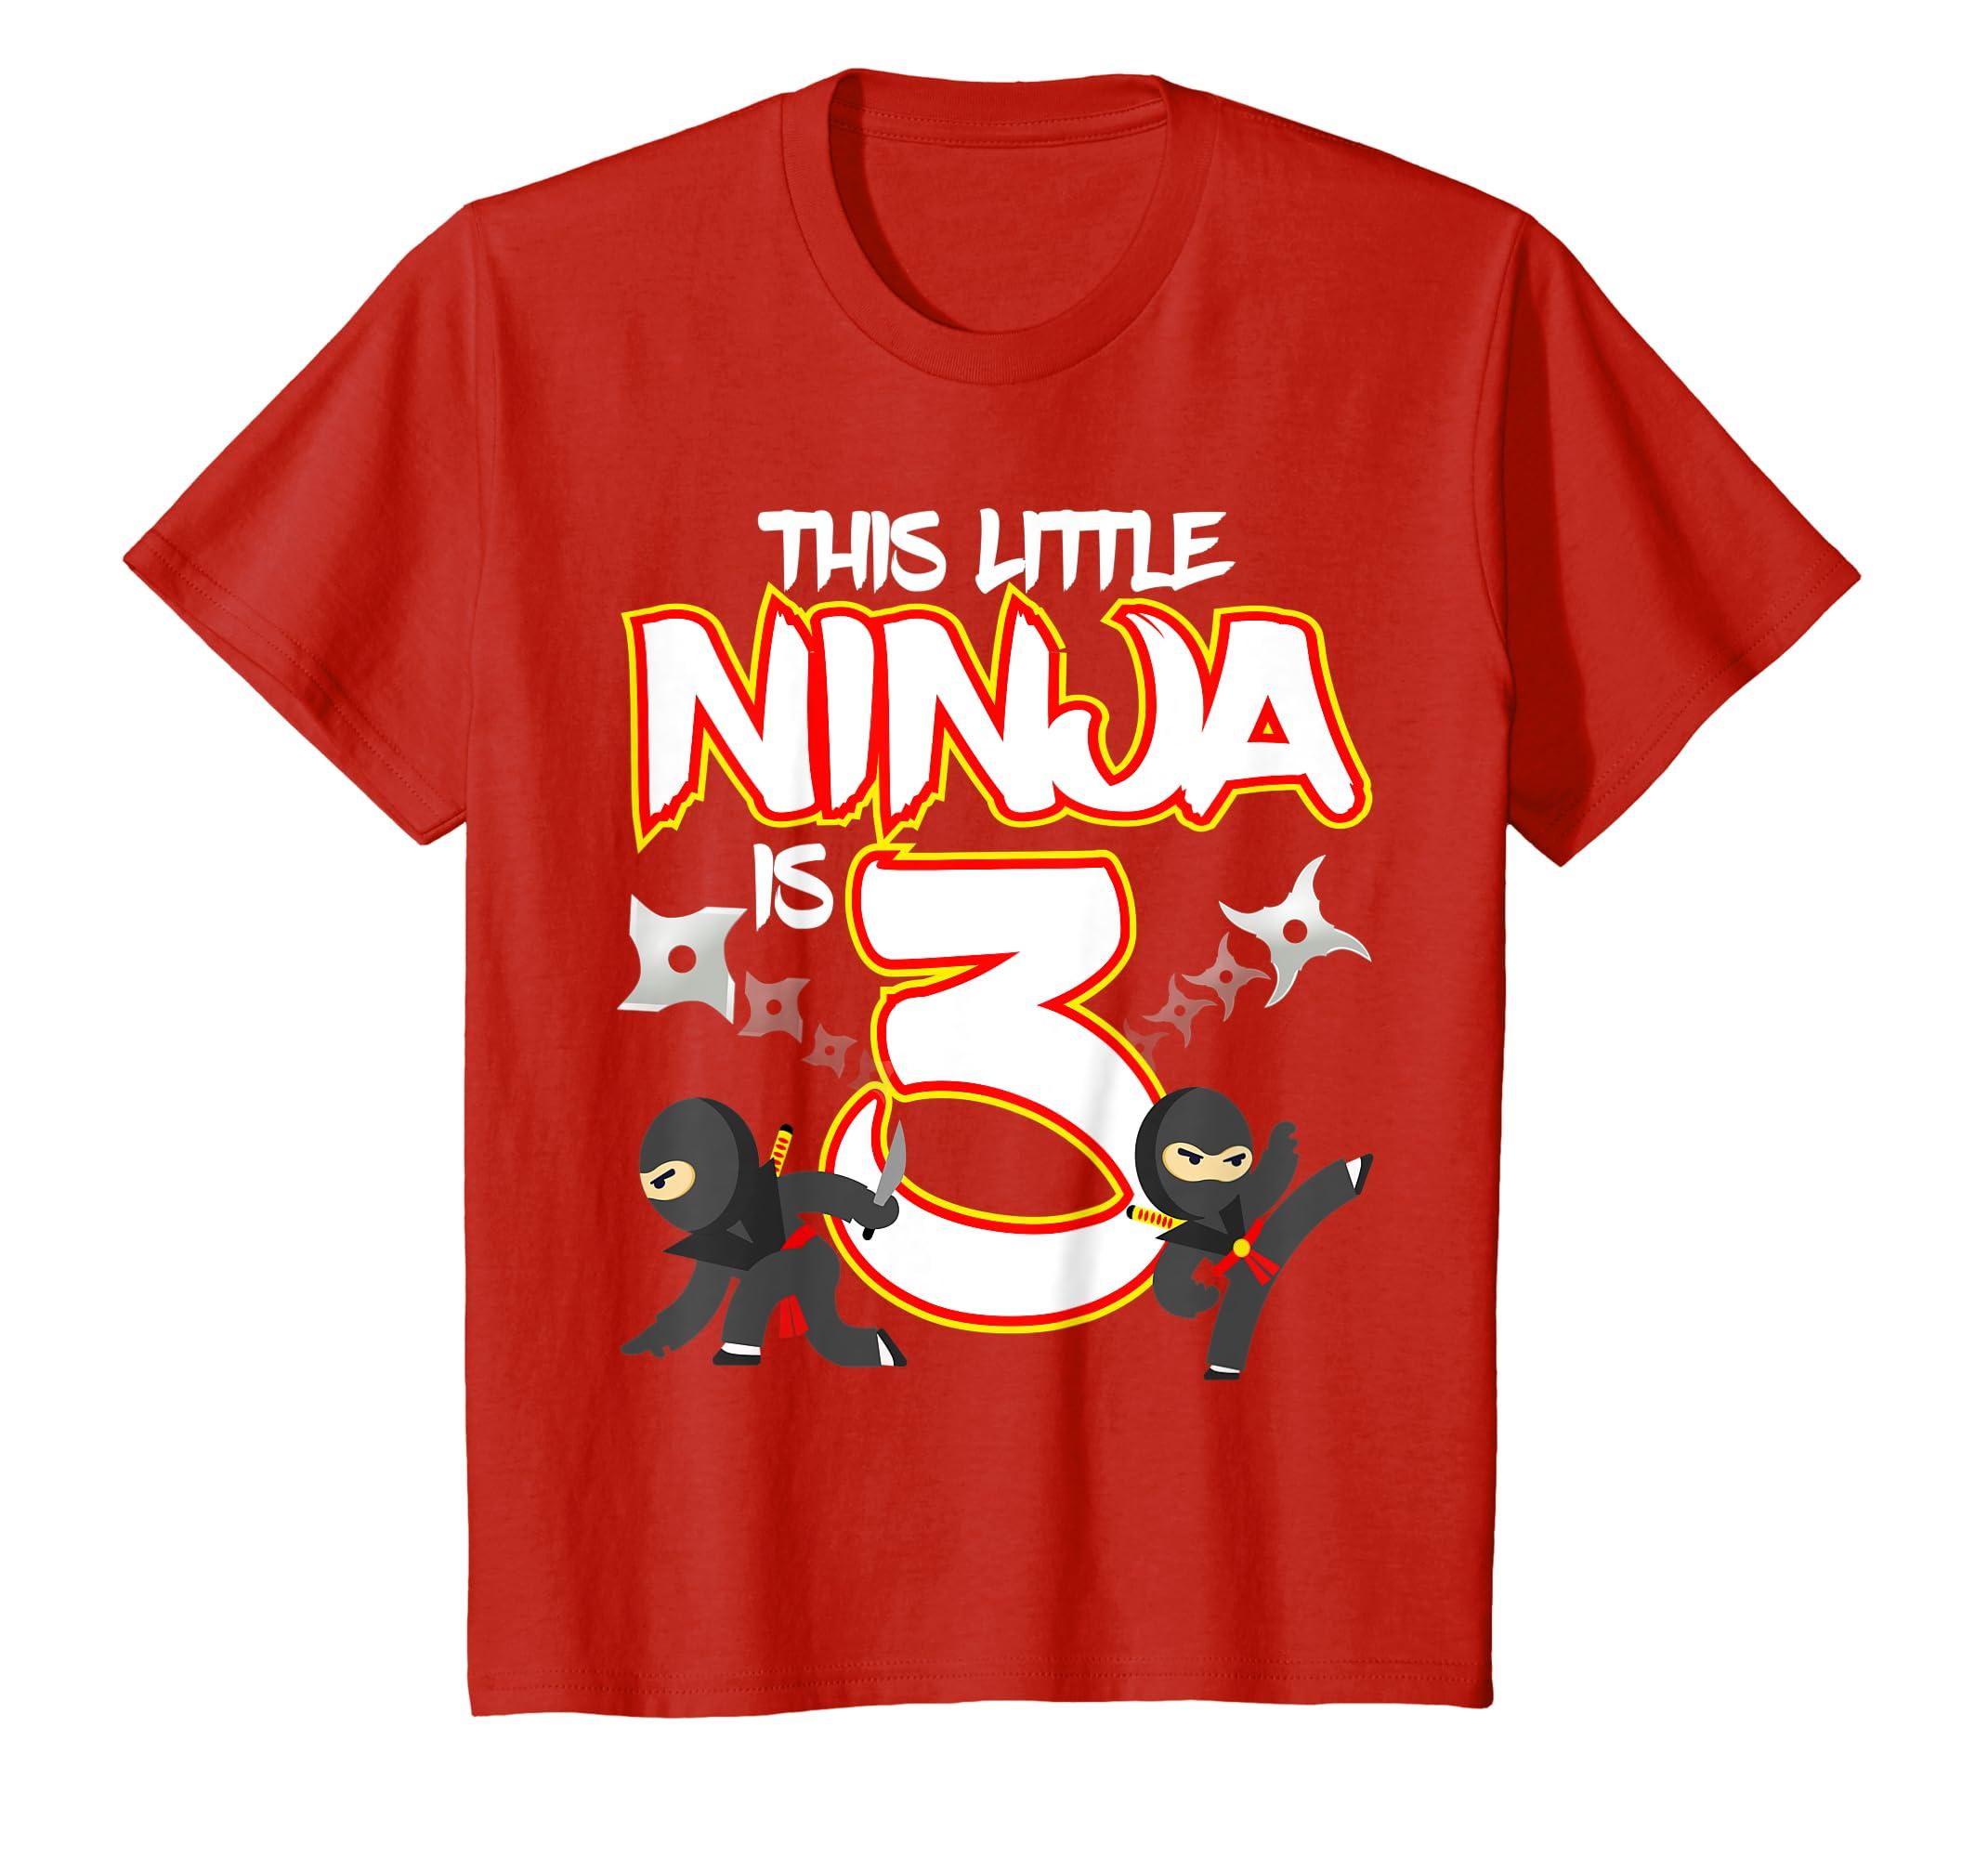 Amazon.com: Kids 3 Year Old Ninja Birthday Shirt Martial ...